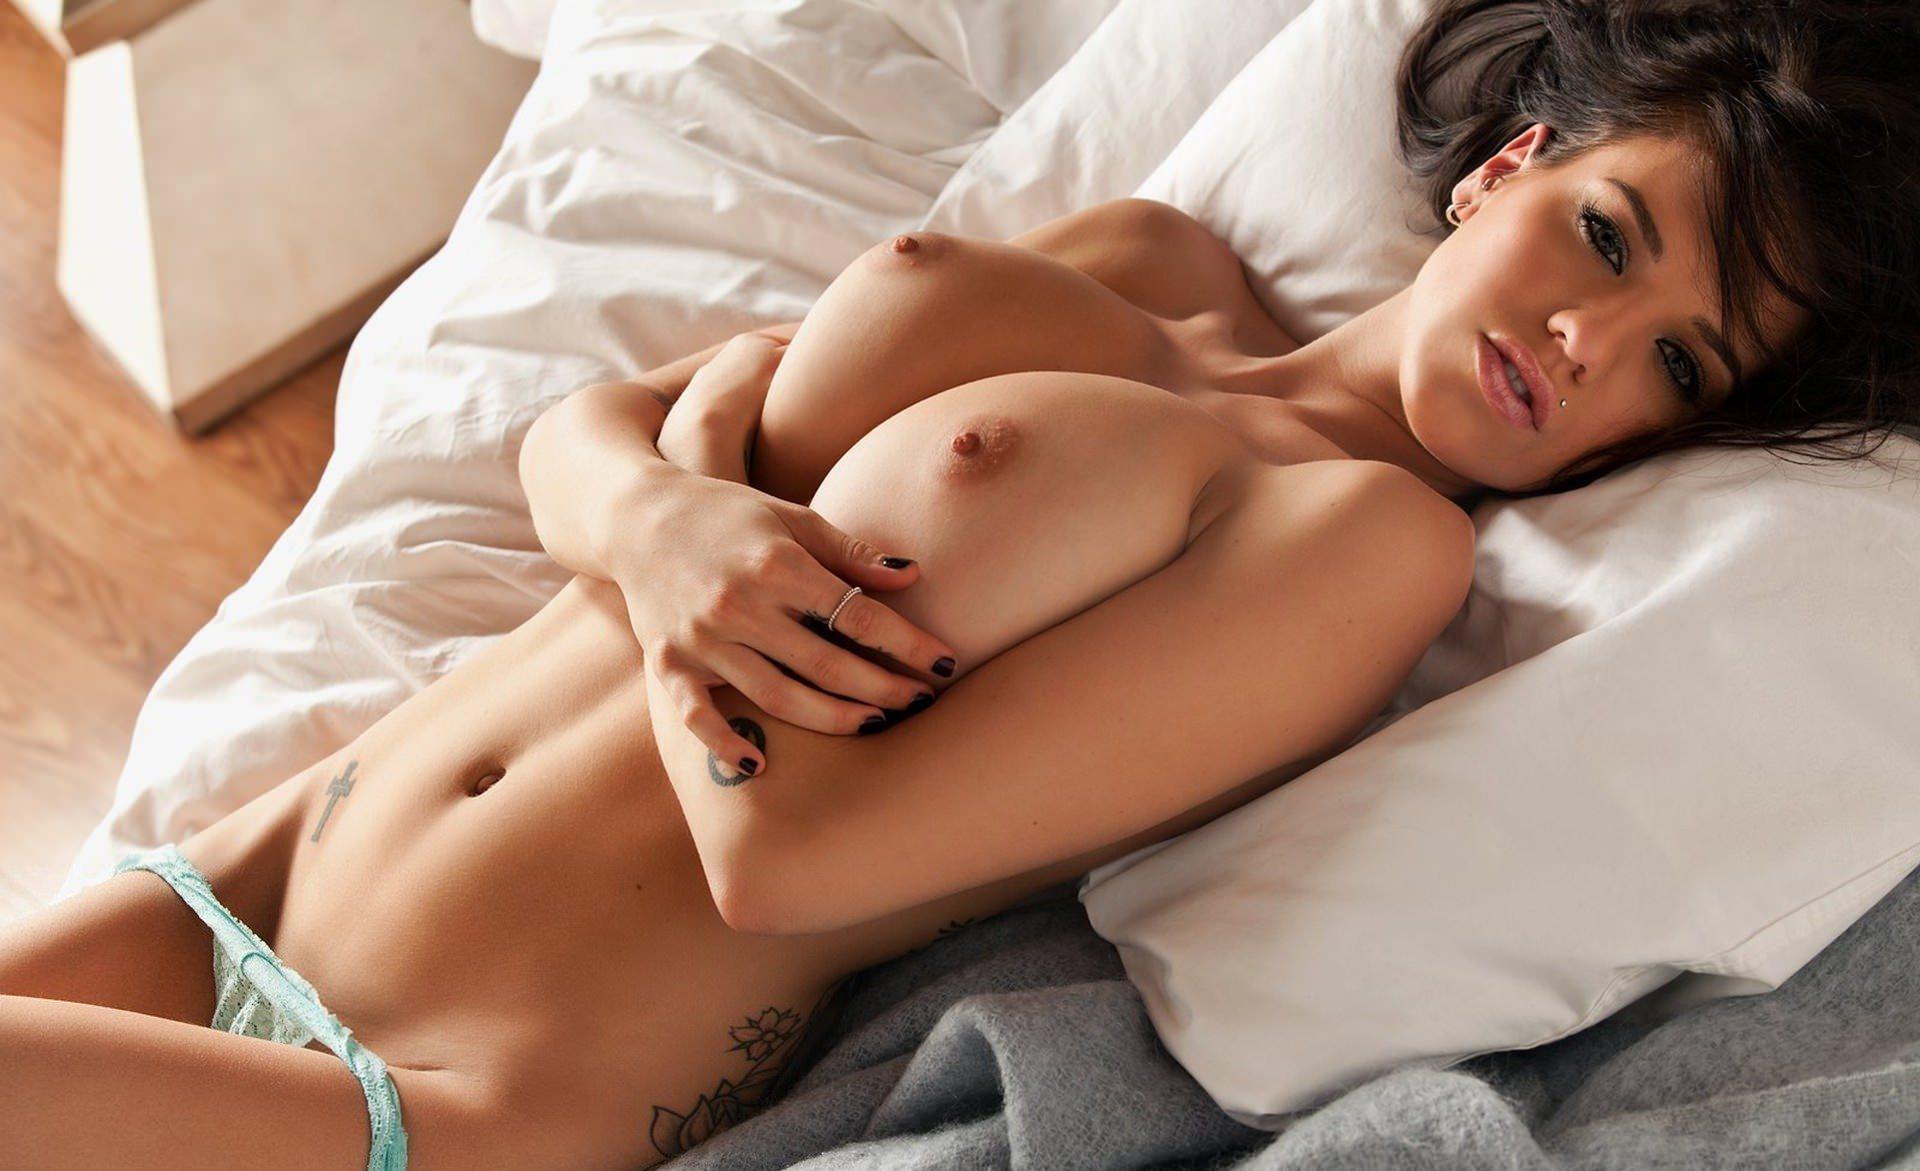 Фото порно эротика грудь сиски 10 фотография